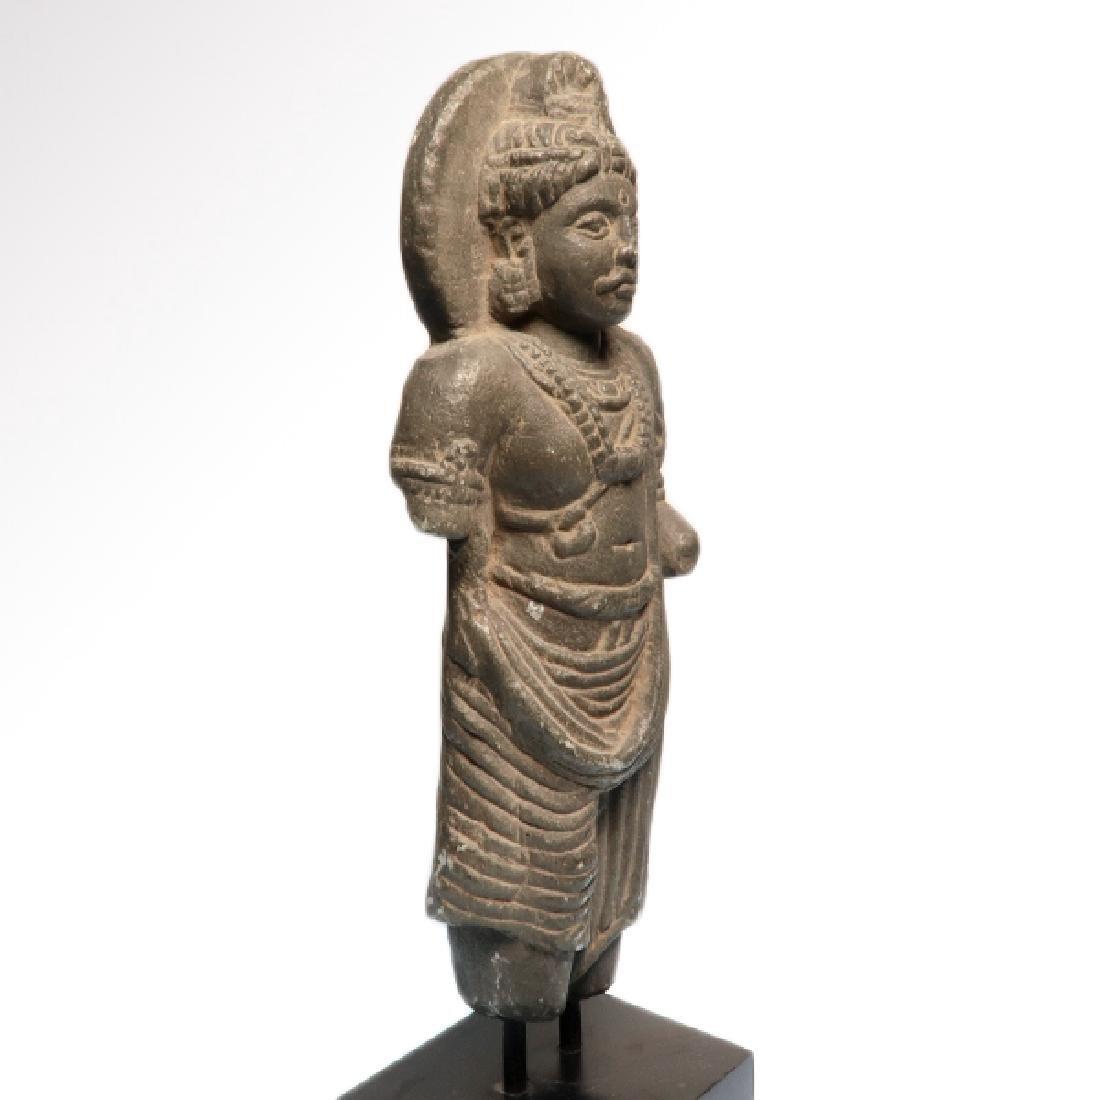 Gandhara Schist Figure of a Standing Buddha, c. 2nd-3rd - 4